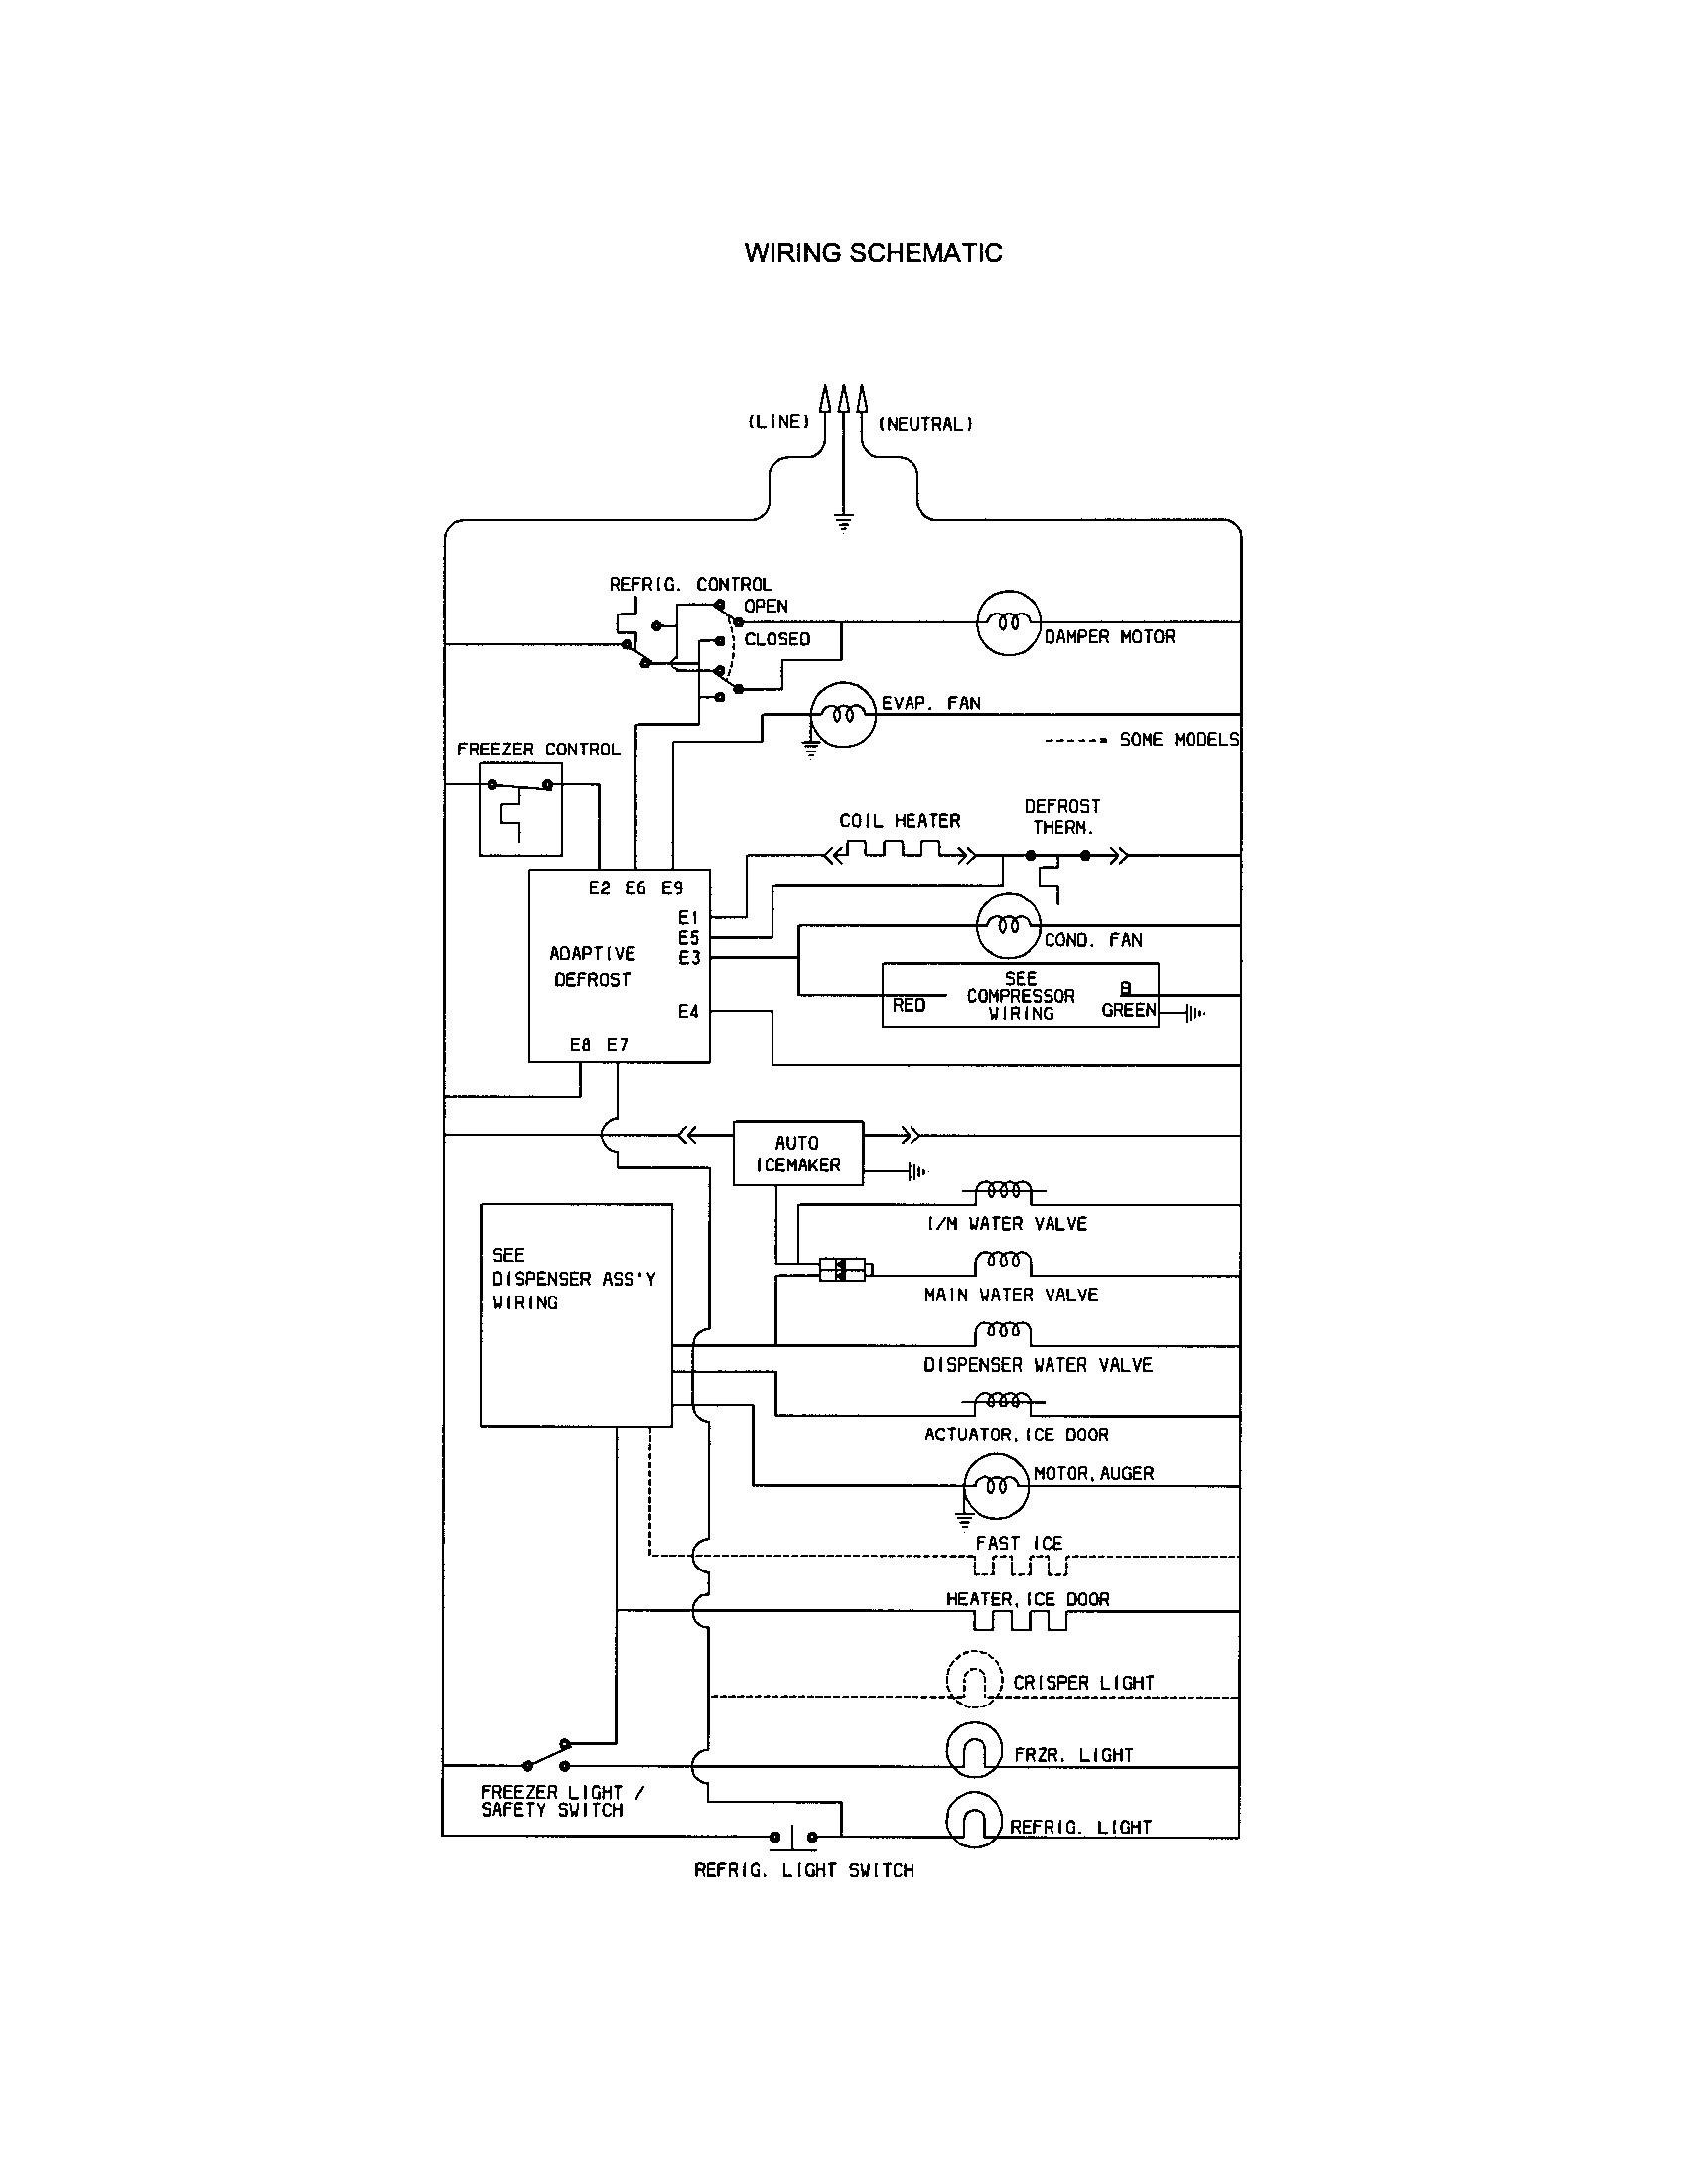 Refrigerator Wiring Receptacle Symbol Free Car Wiring Diagrams \u2022 Home Wiring  Diagrams 2 Way Wiring Diagram Refrigeration